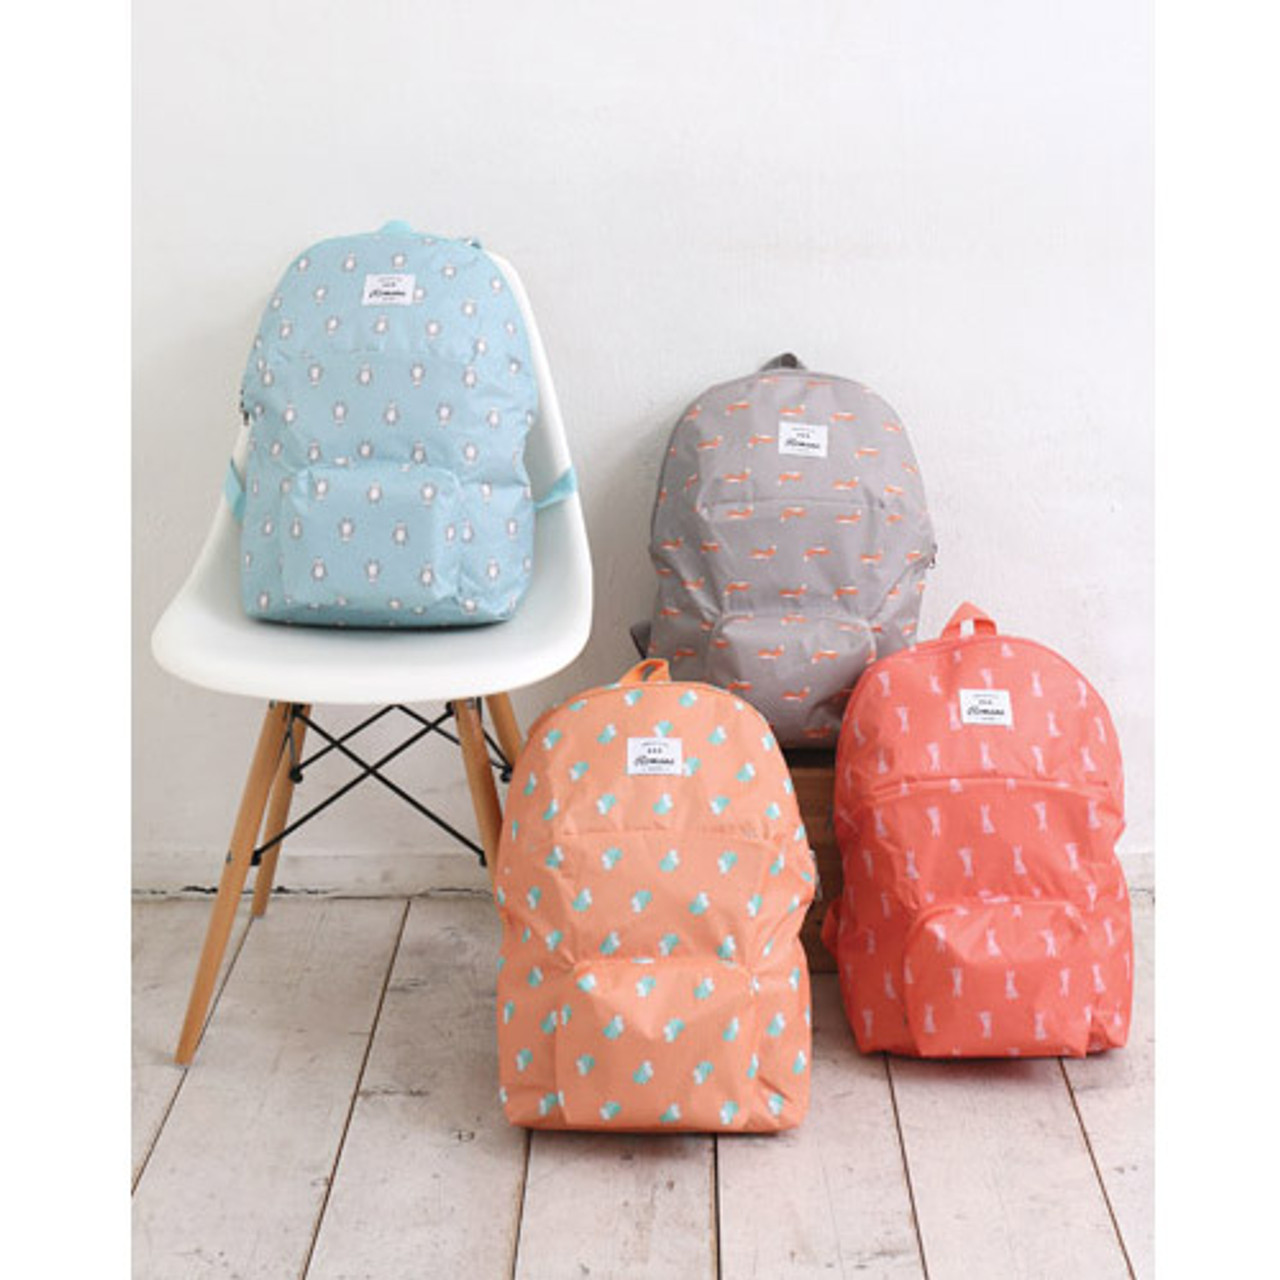 450088f45 Romane Mr.wood pocket foldable backpack - fallindesign